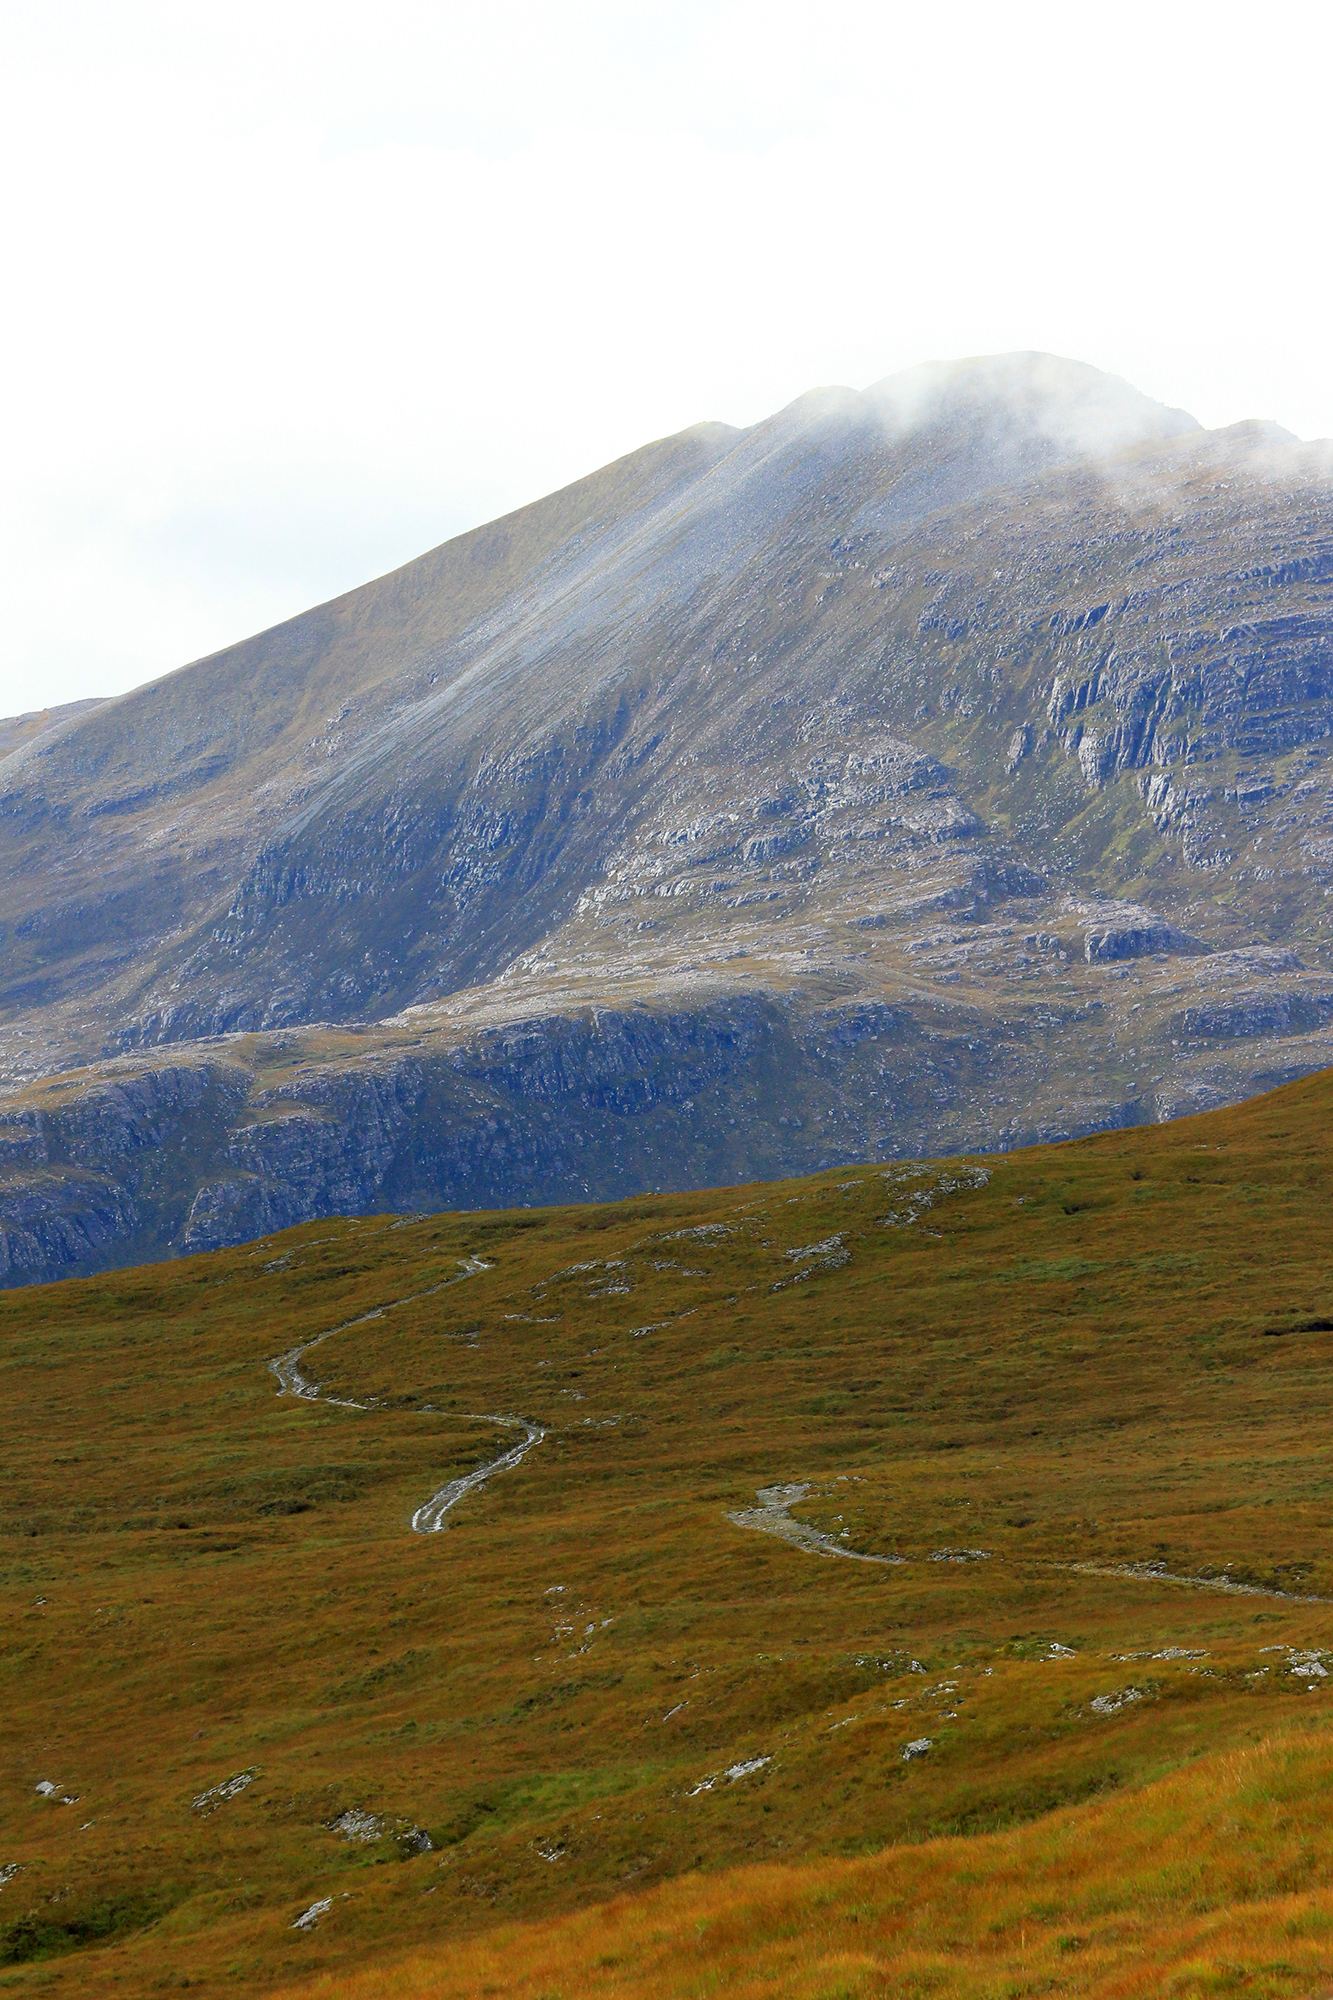 Sendero montañés